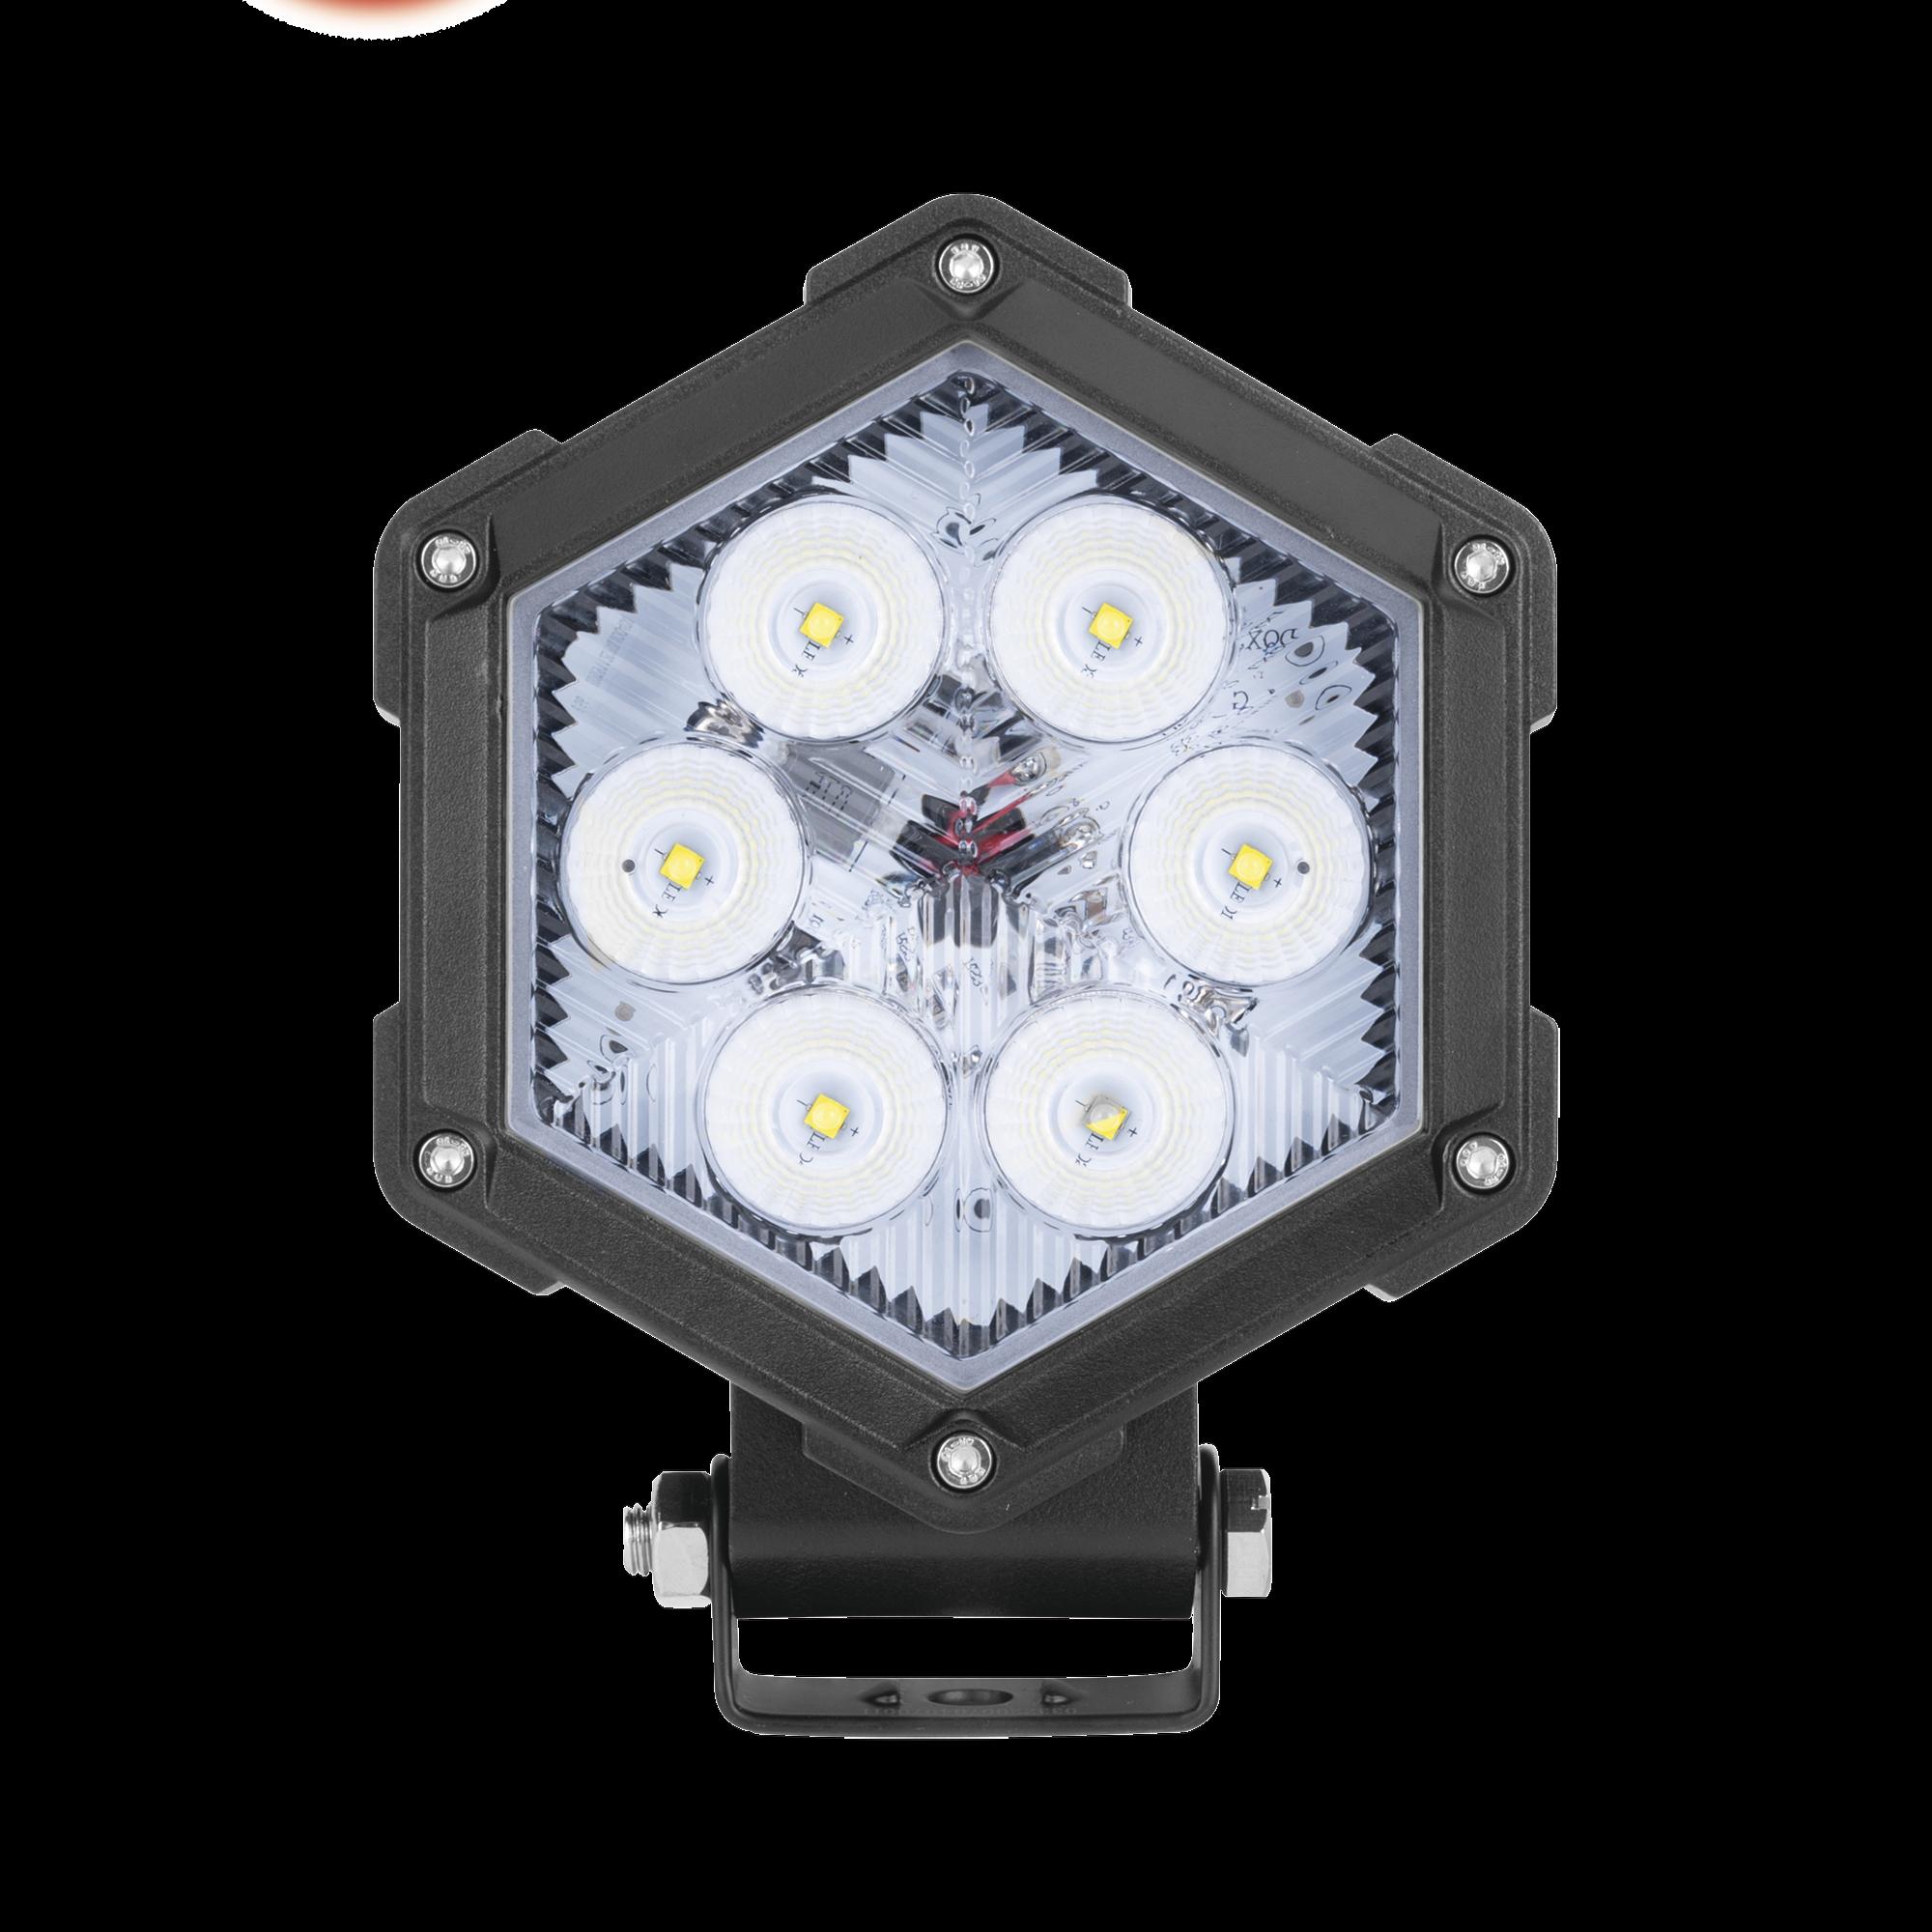 Luz de trabajo ultra brillante, 6 led, 30 watts, 12-24 Vcd